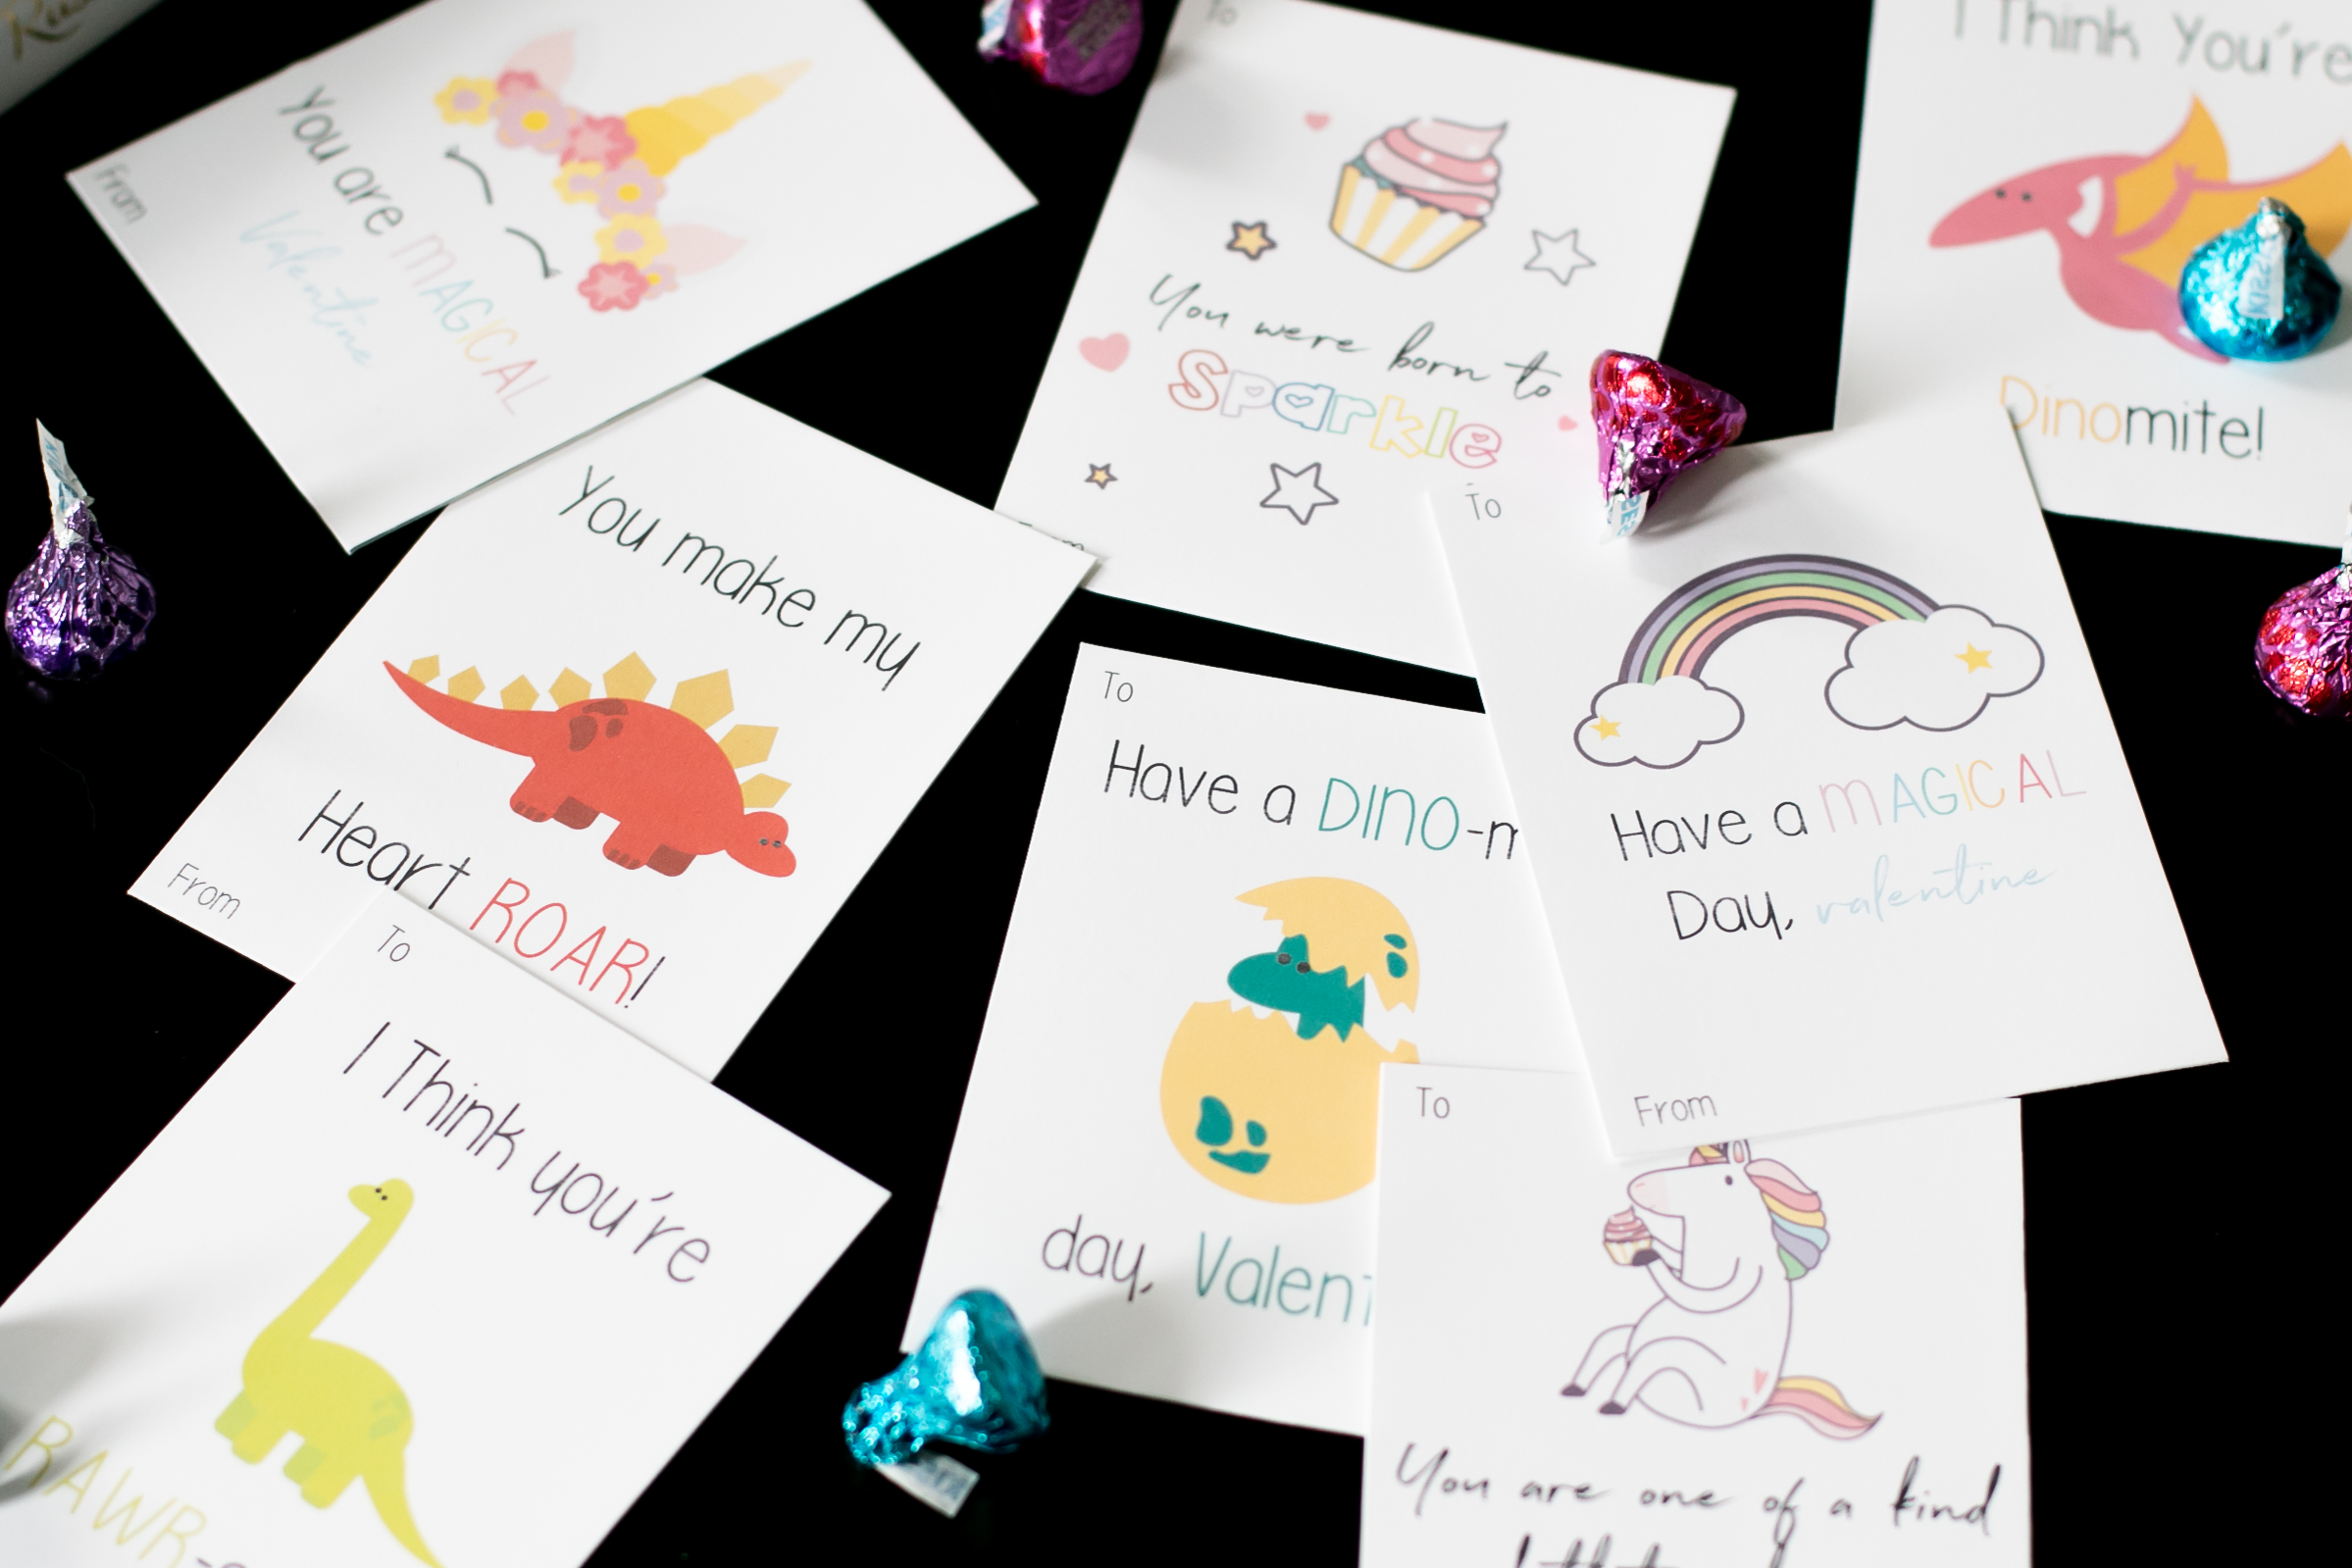 Free Printable Unicorn and Dinosaur Themed Valentines Day Cards.jpg